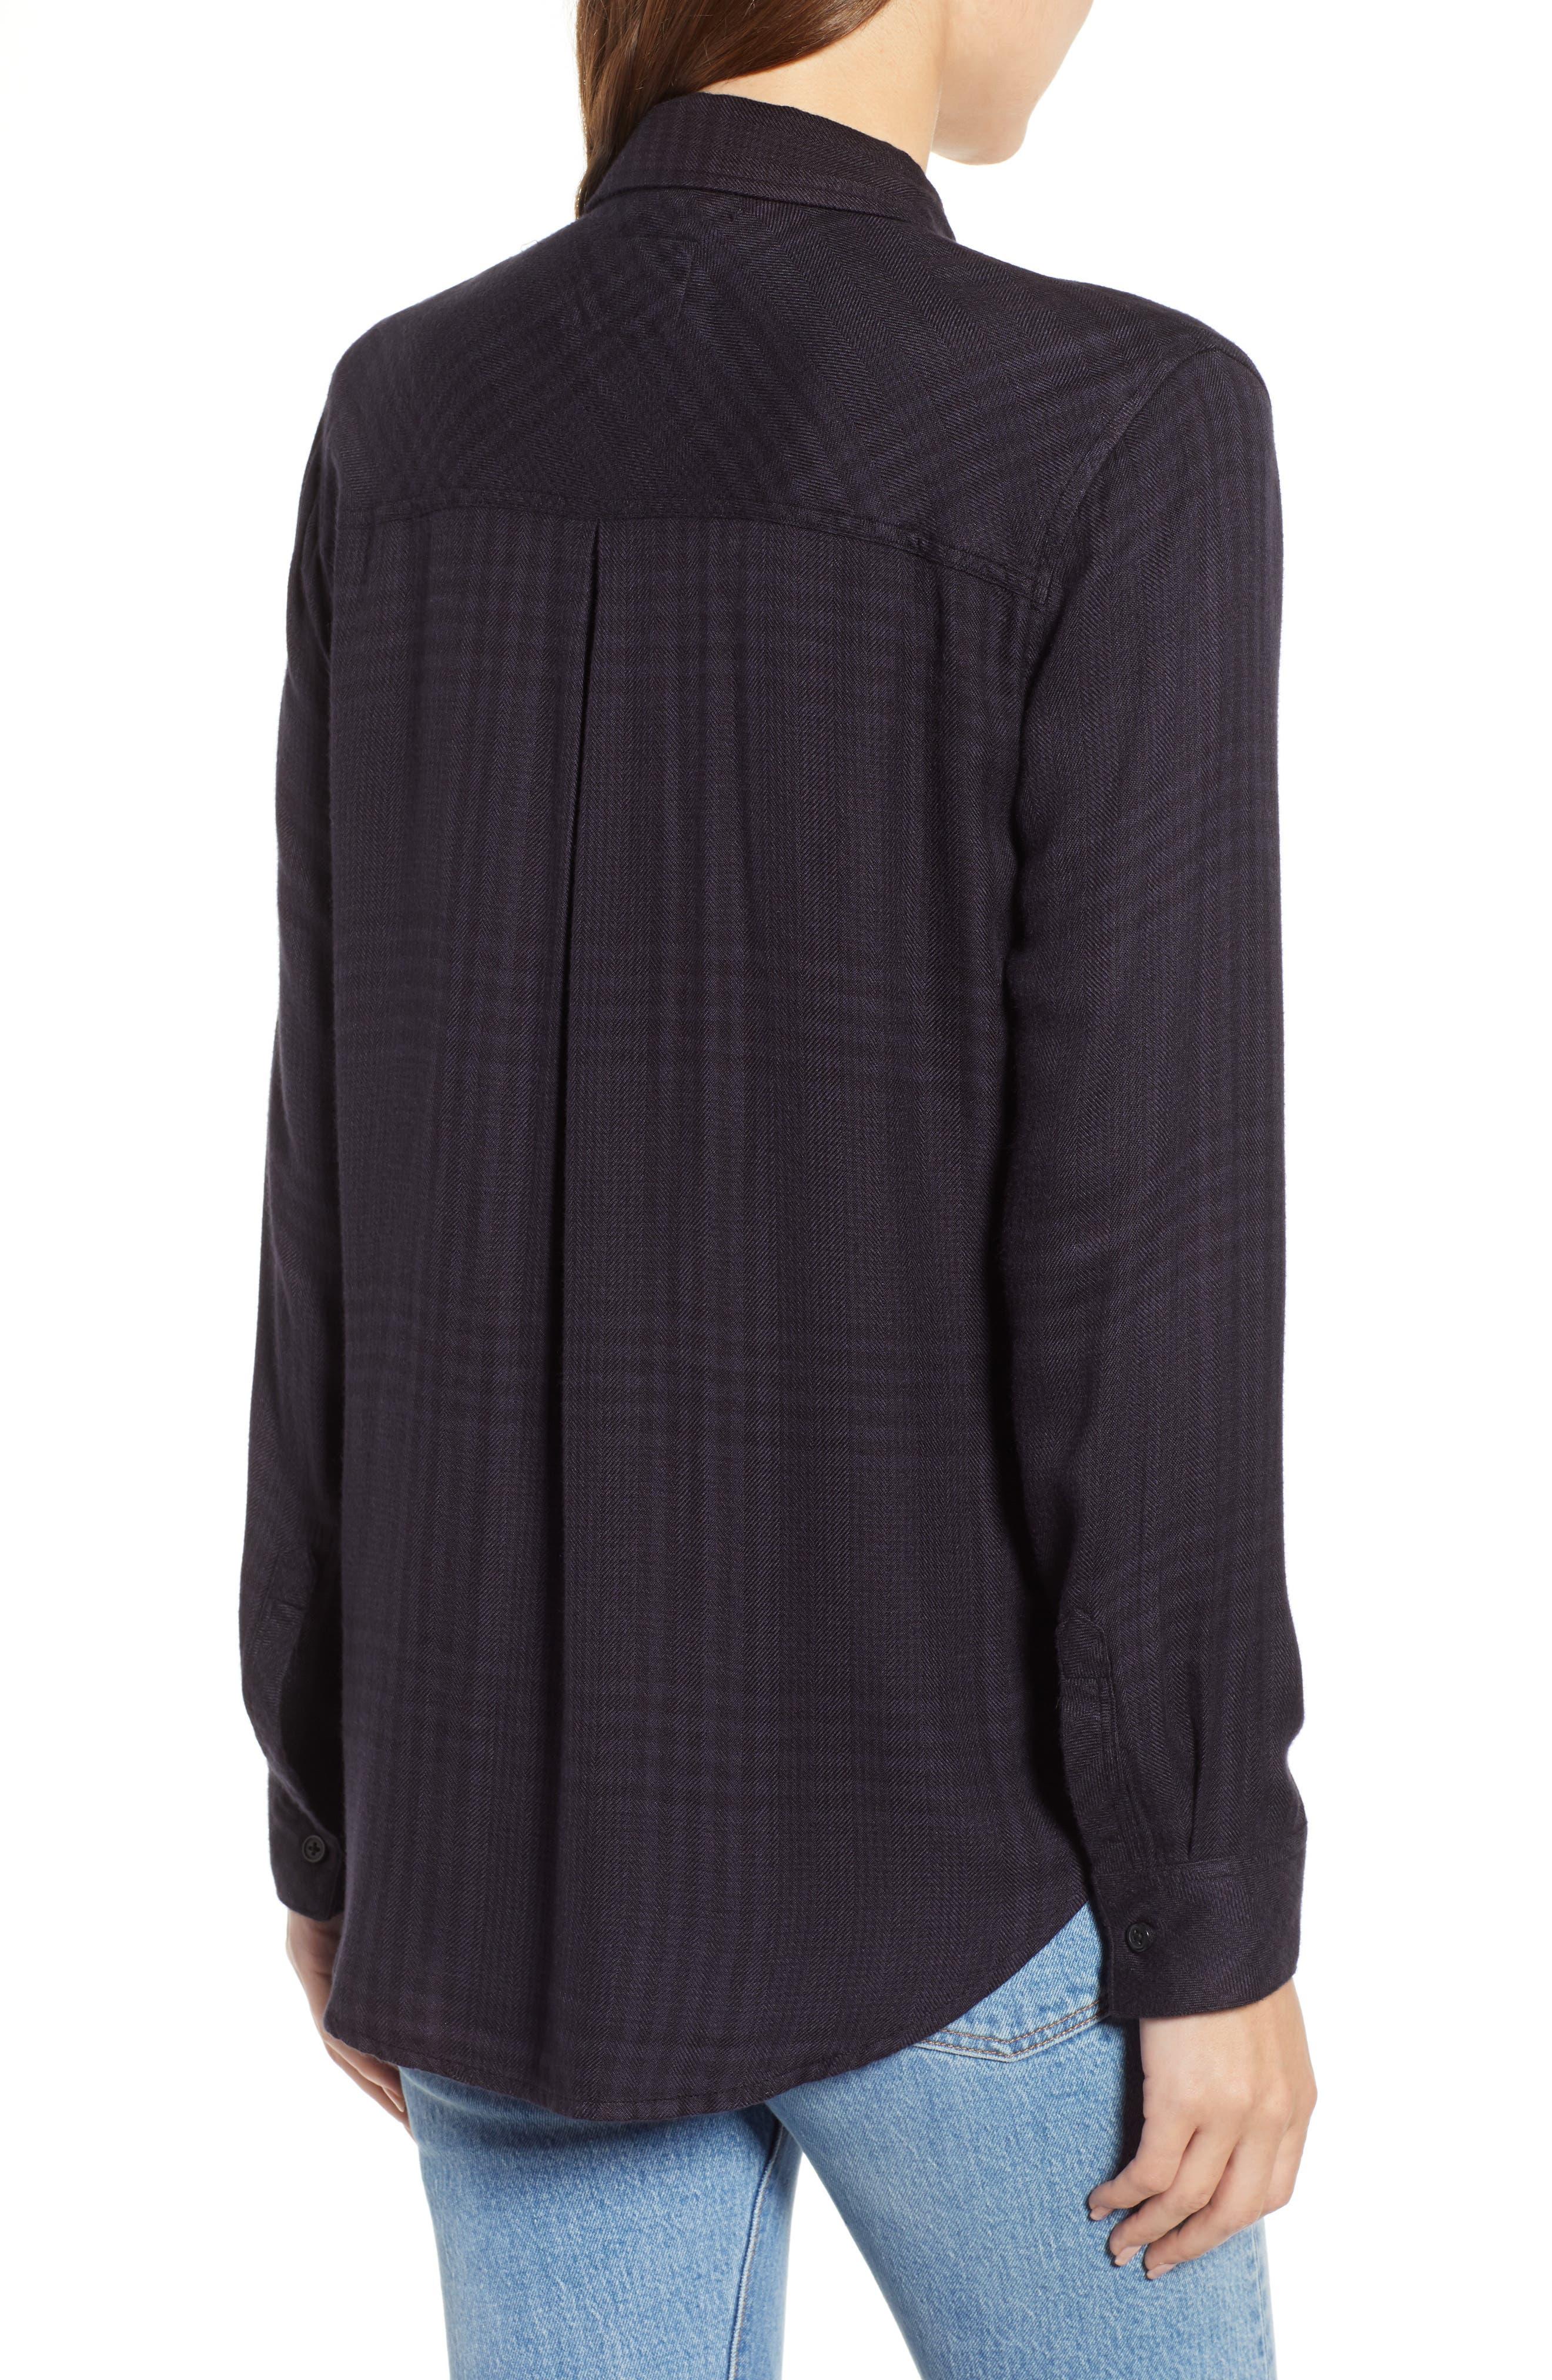 Hunter Plaid Shirt,                             Alternate thumbnail 2, color,                             CHARCOAL SHADOW